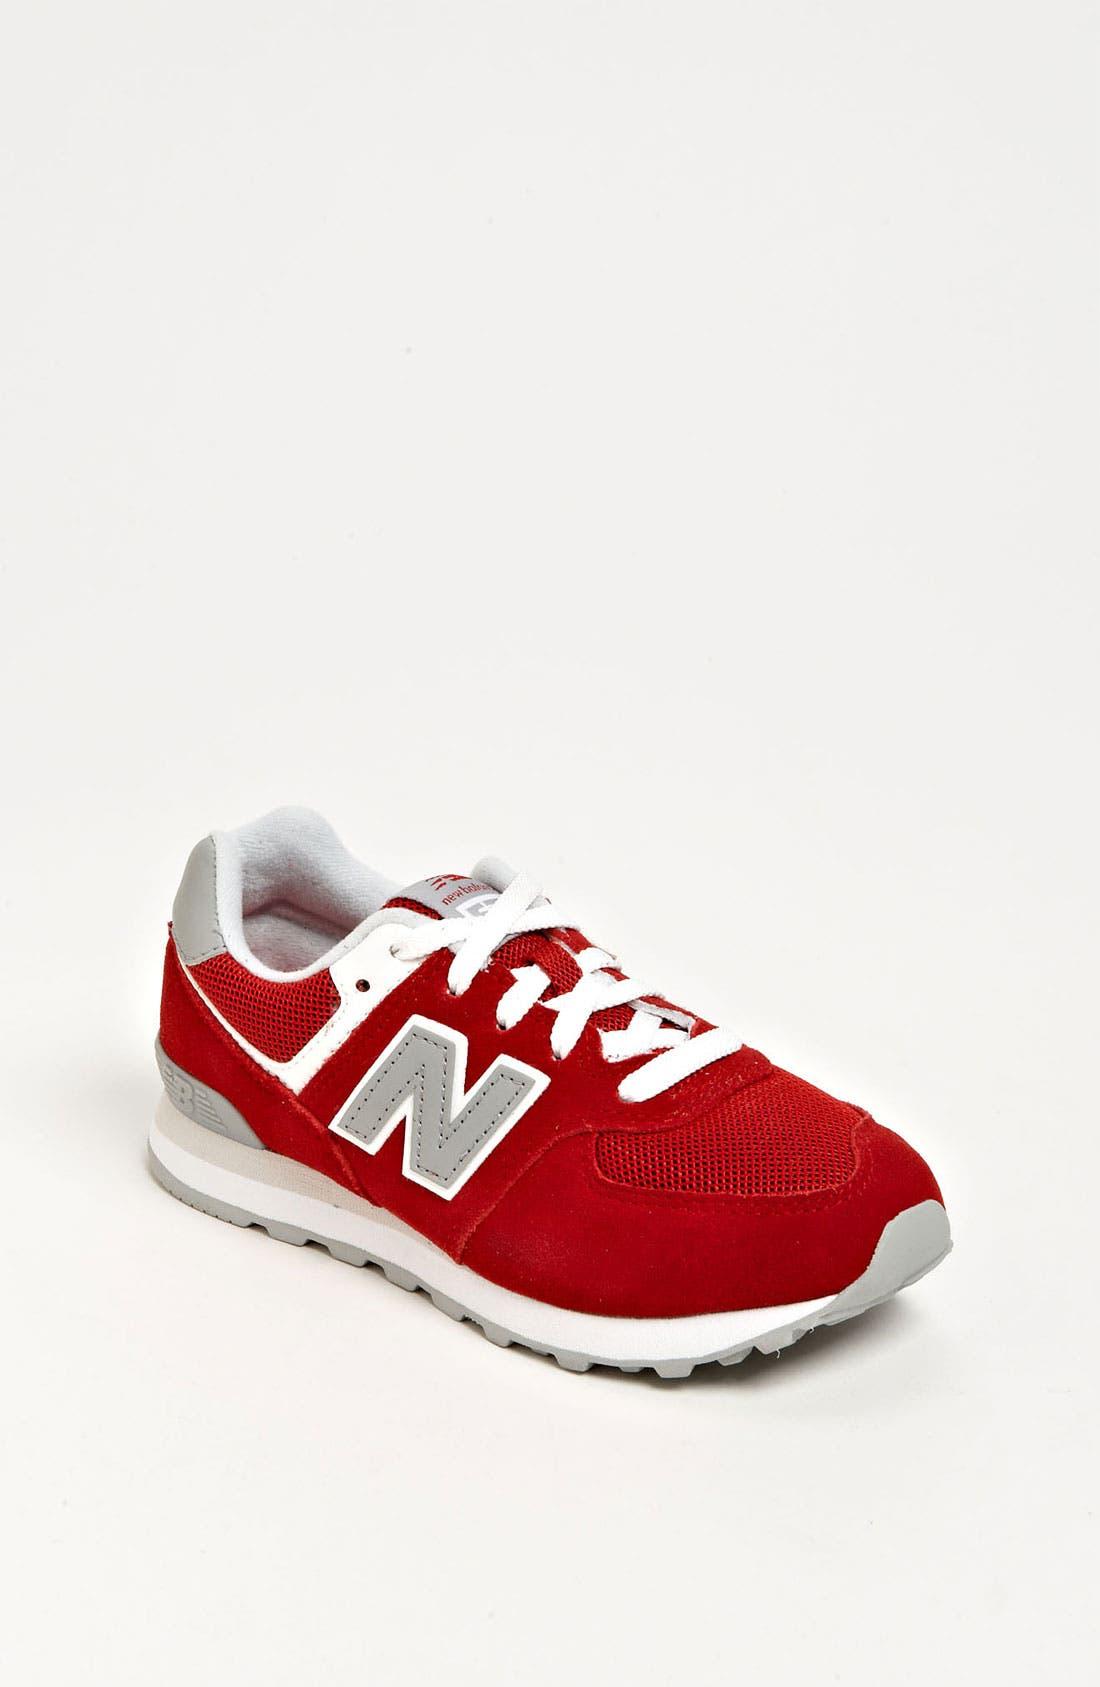 Alternate Image 1 Selected - New Balance 'ML574' Running Shoe (Toddler, Little Kid & Big Kid)